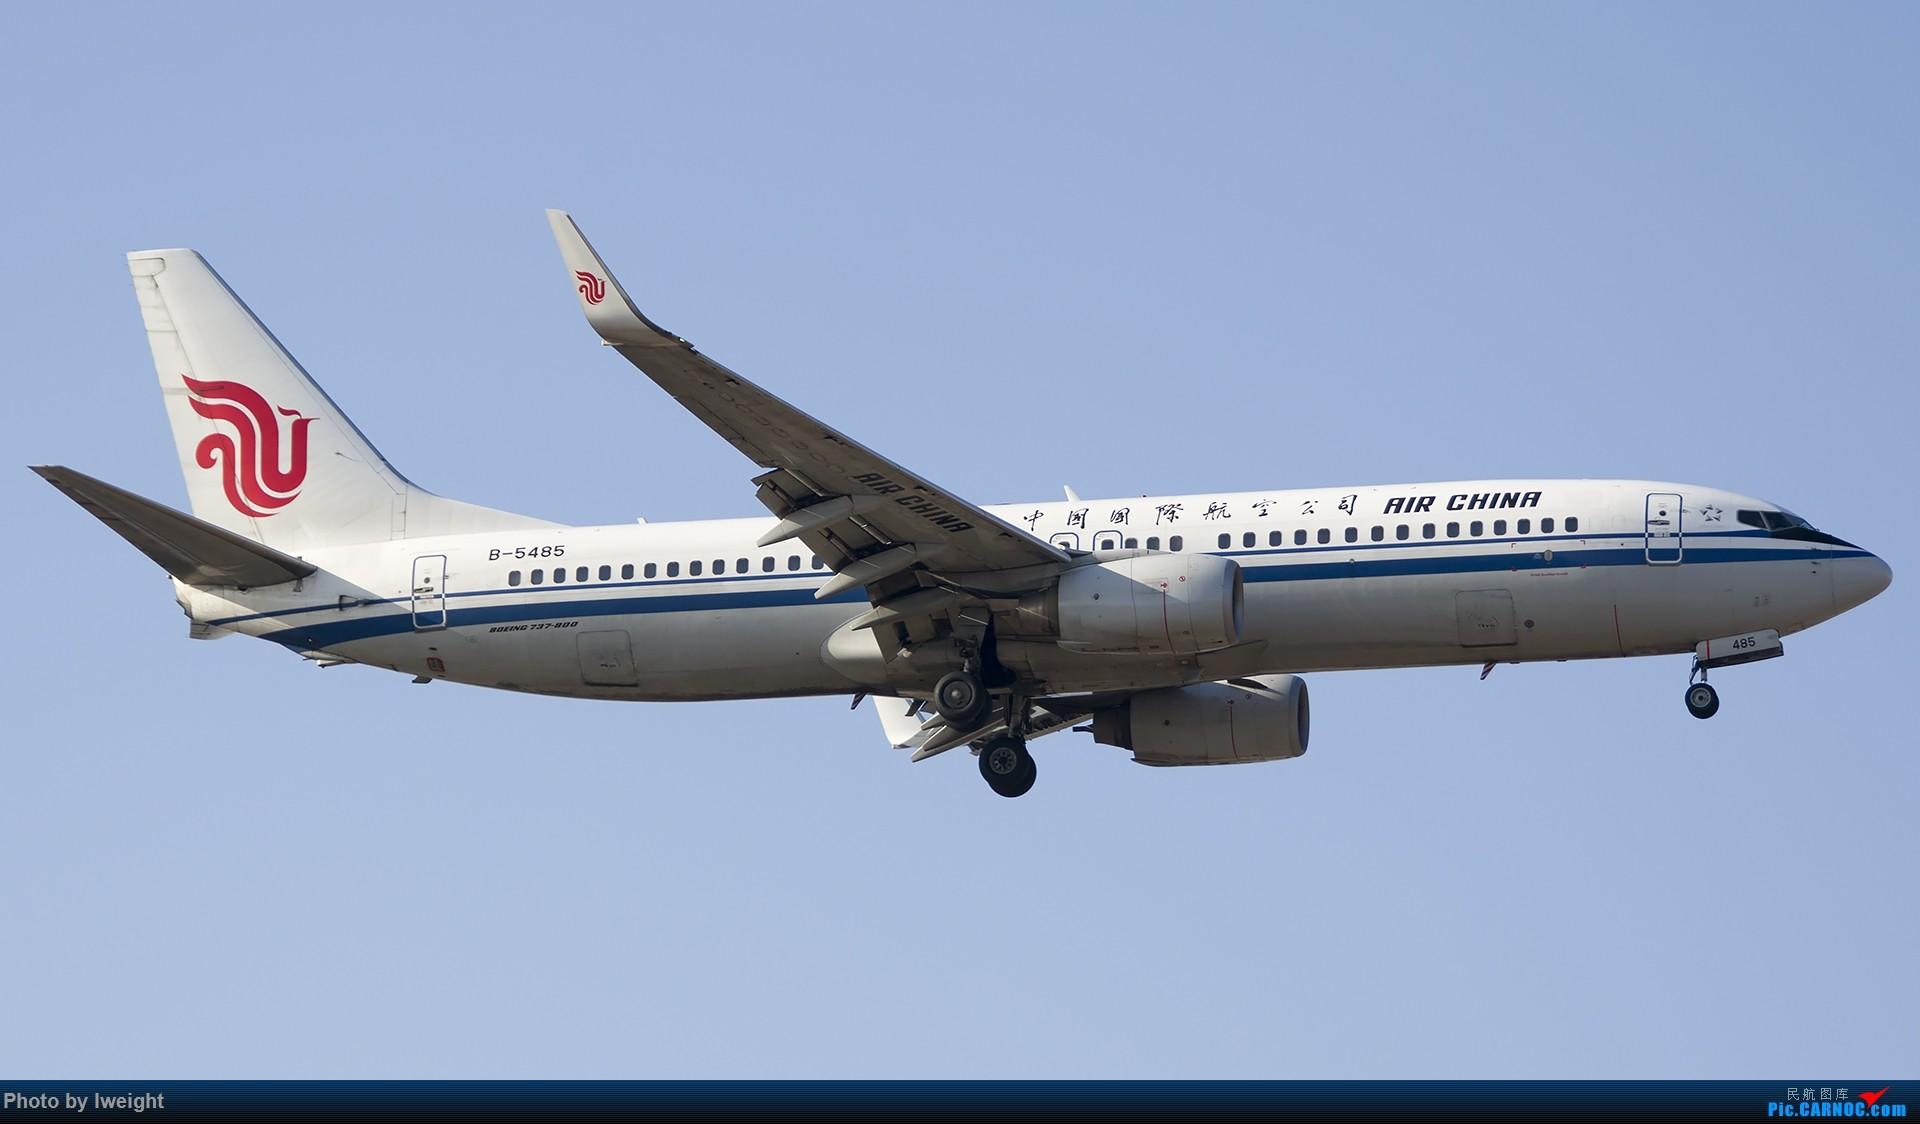 Re:[原创]庆祝升级777,发上今天在首都机场拍的所有飞机【2014-12-14】 BOEING 737-800 B-5485 中国北京首都国际机场